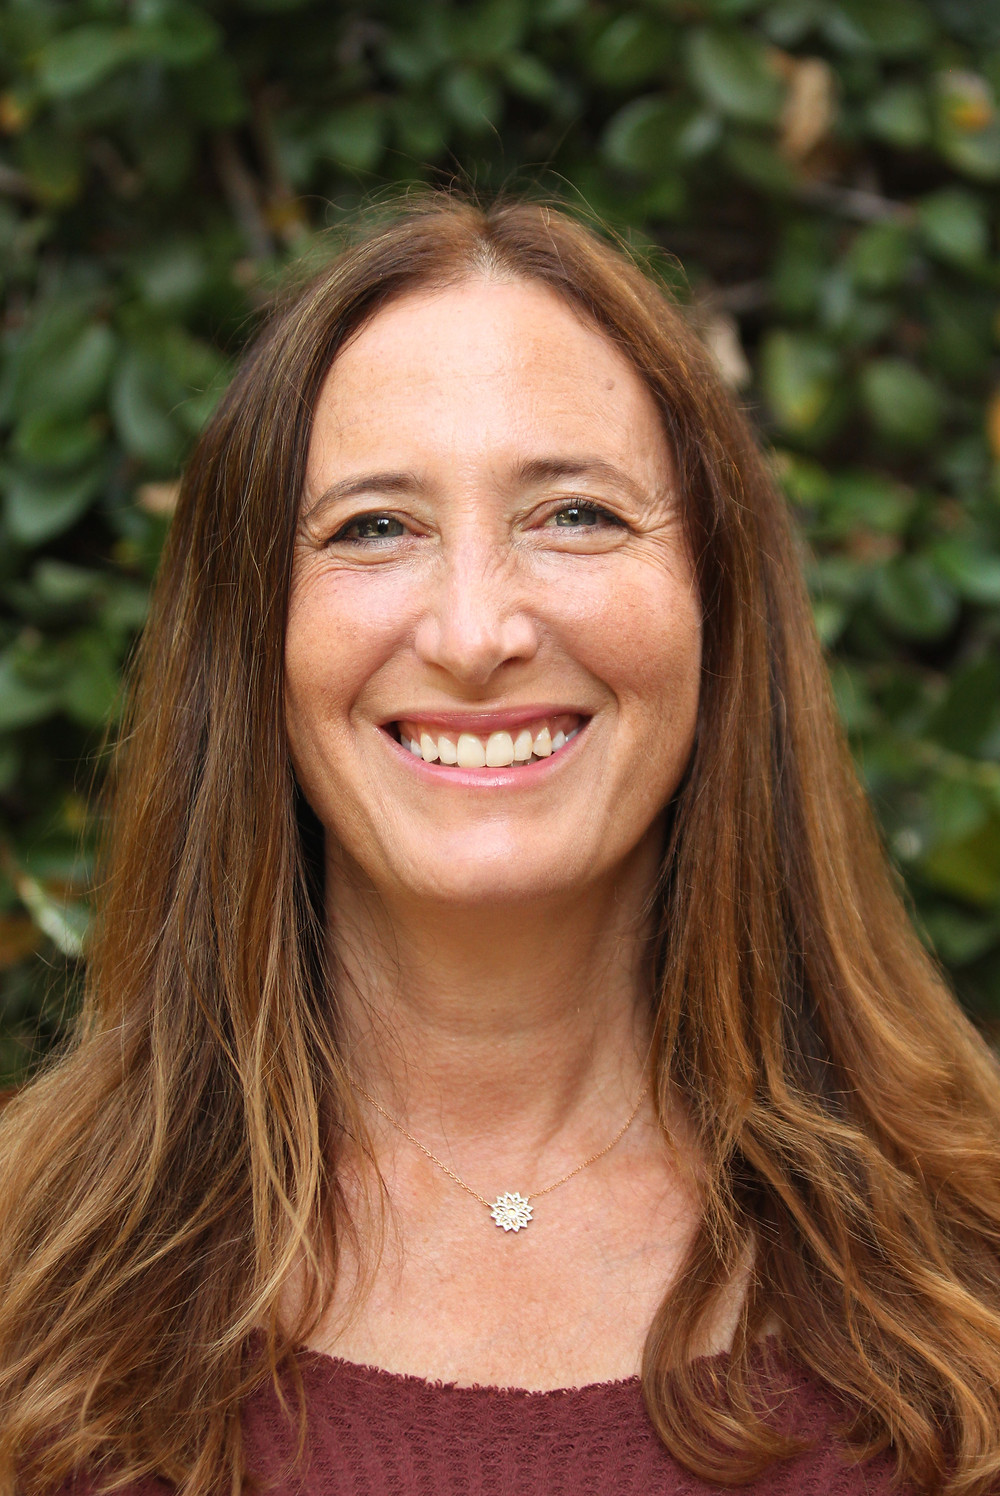 Headshot of Sherri Cadmus with a greenery background